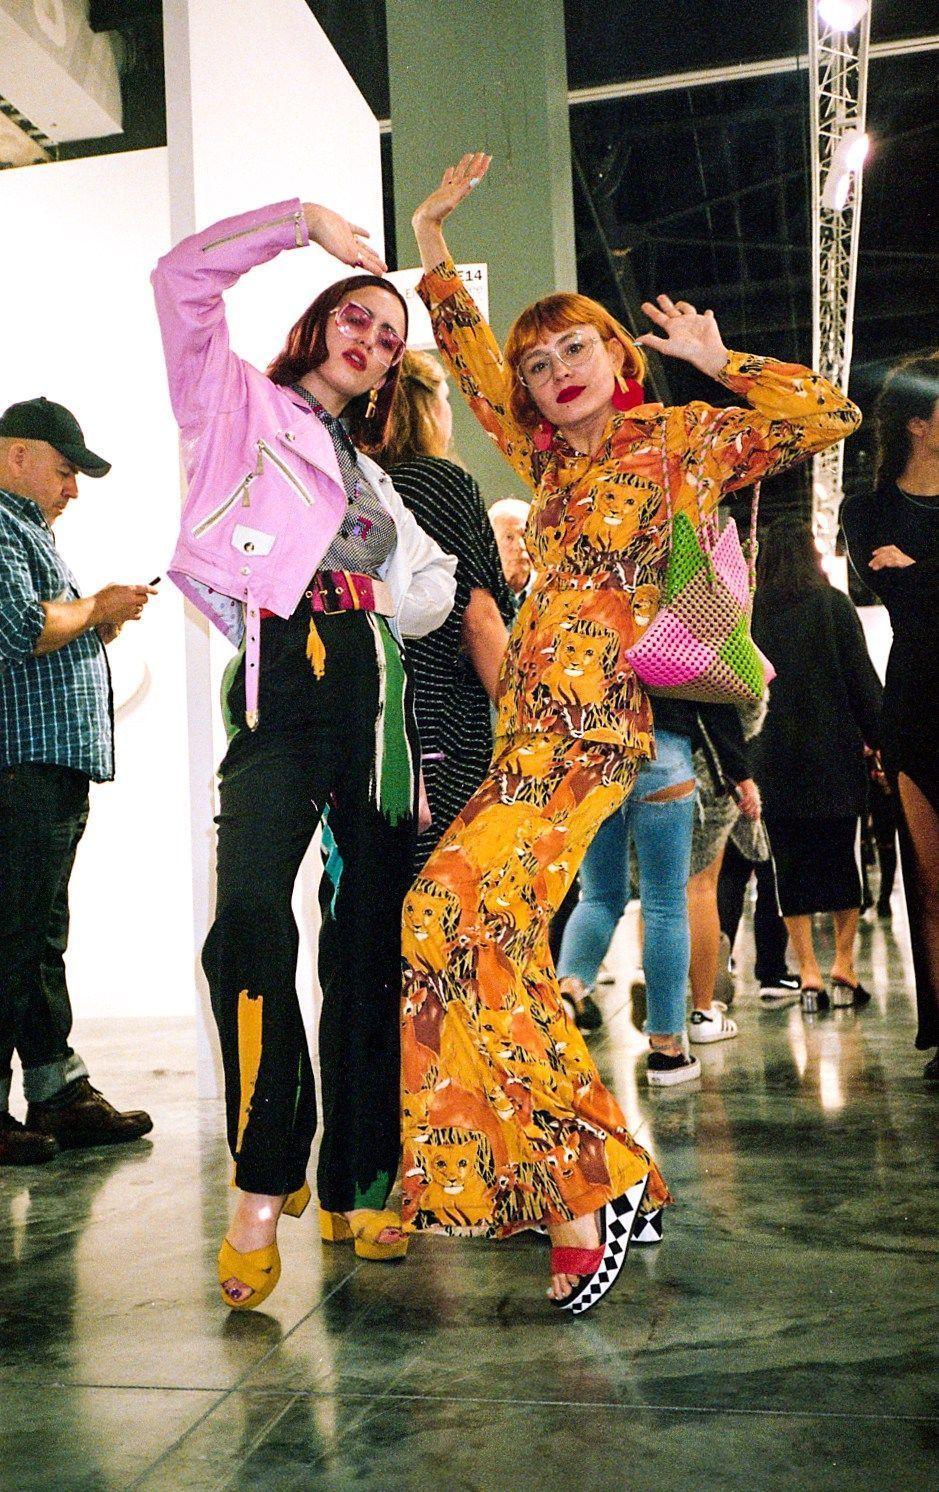 Photo Diary: Aaliyah, Fashion, Art, and Under-boobs at Art Basel Miami #aaliyahfashion Photo Diary: Aaliyah, Fashion, Art, and Under-boobs at Art Basel Miami - Nasty Galaxy #aaliyahfashion Photo Diary: Aaliyah, Fashion, Art, and Under-boobs at Art Basel Miami #aaliyahfashion Photo Diary: Aaliyah, Fashion, Art, and Under-boobs at Art Basel Miami - Nasty Galaxy #aaliyahfashion Photo Diary: Aaliyah, Fashion, Art, and Under-boobs at Art Basel Miami #aaliyahfashion Photo Diary: Aaliyah, Fashion, Art, #aaliyahfashion